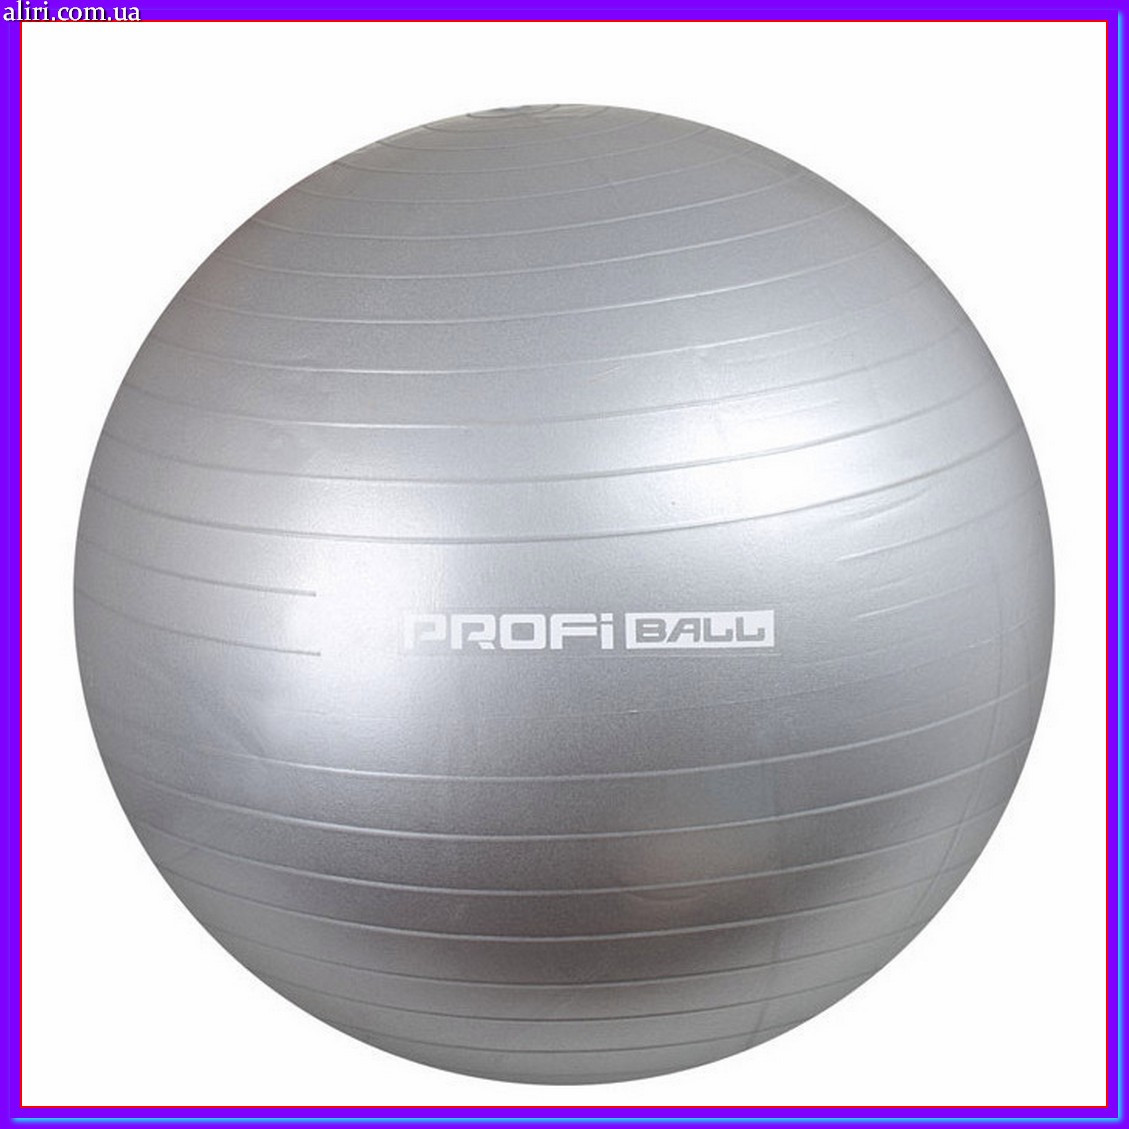 Мяч для фитнеса MS 1577 серый 75см